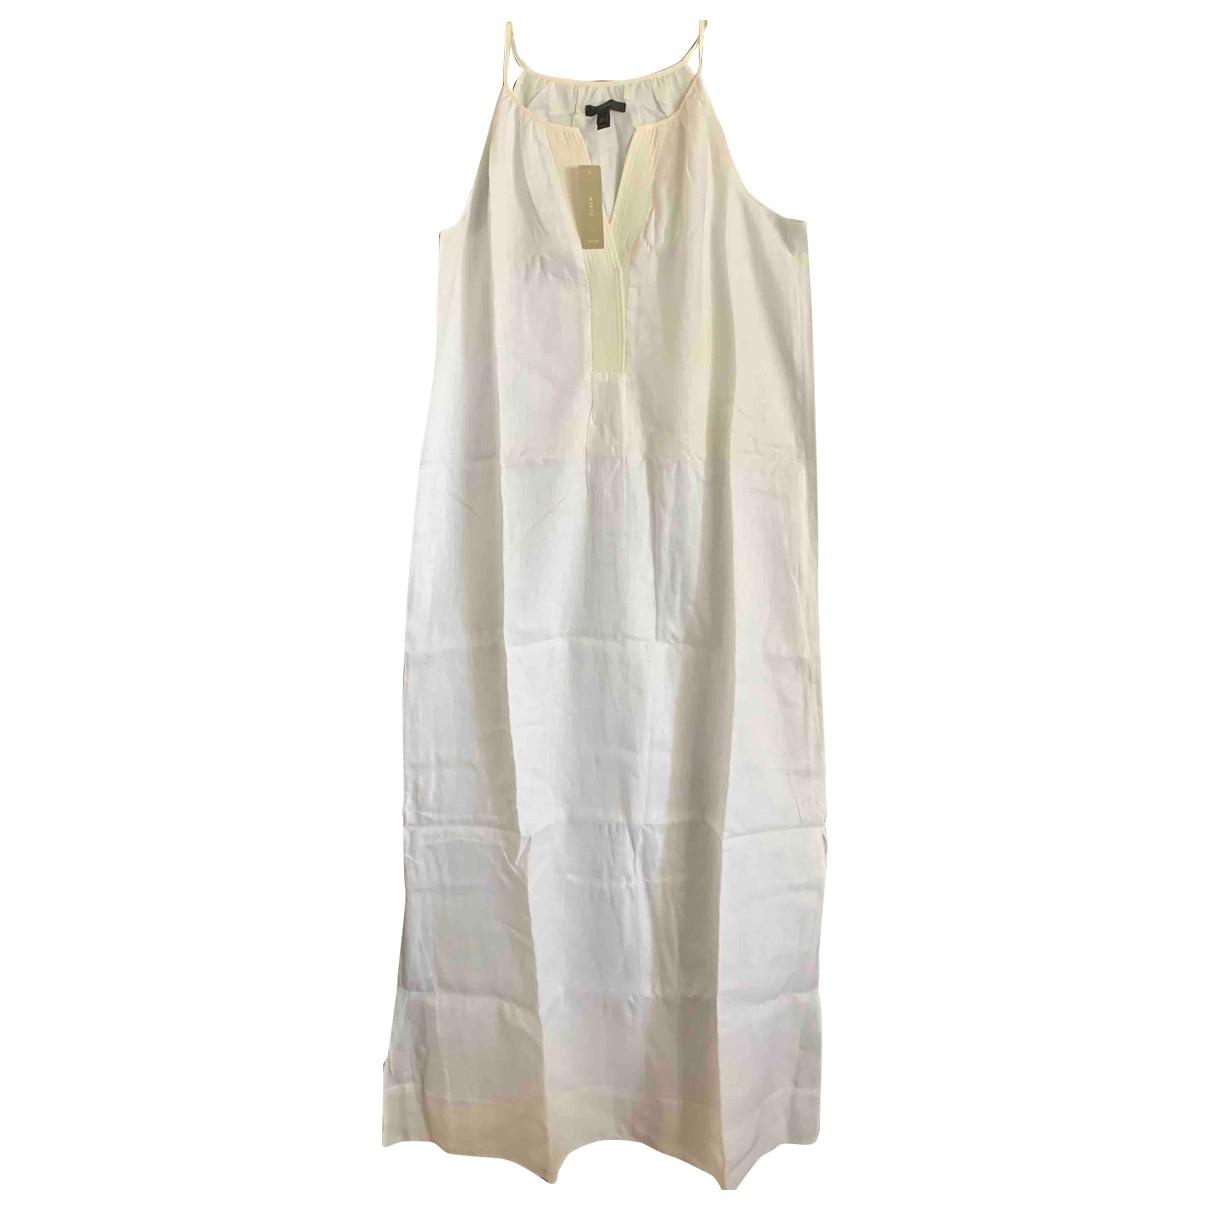 J.crew \N White Cotton dress for Women M International